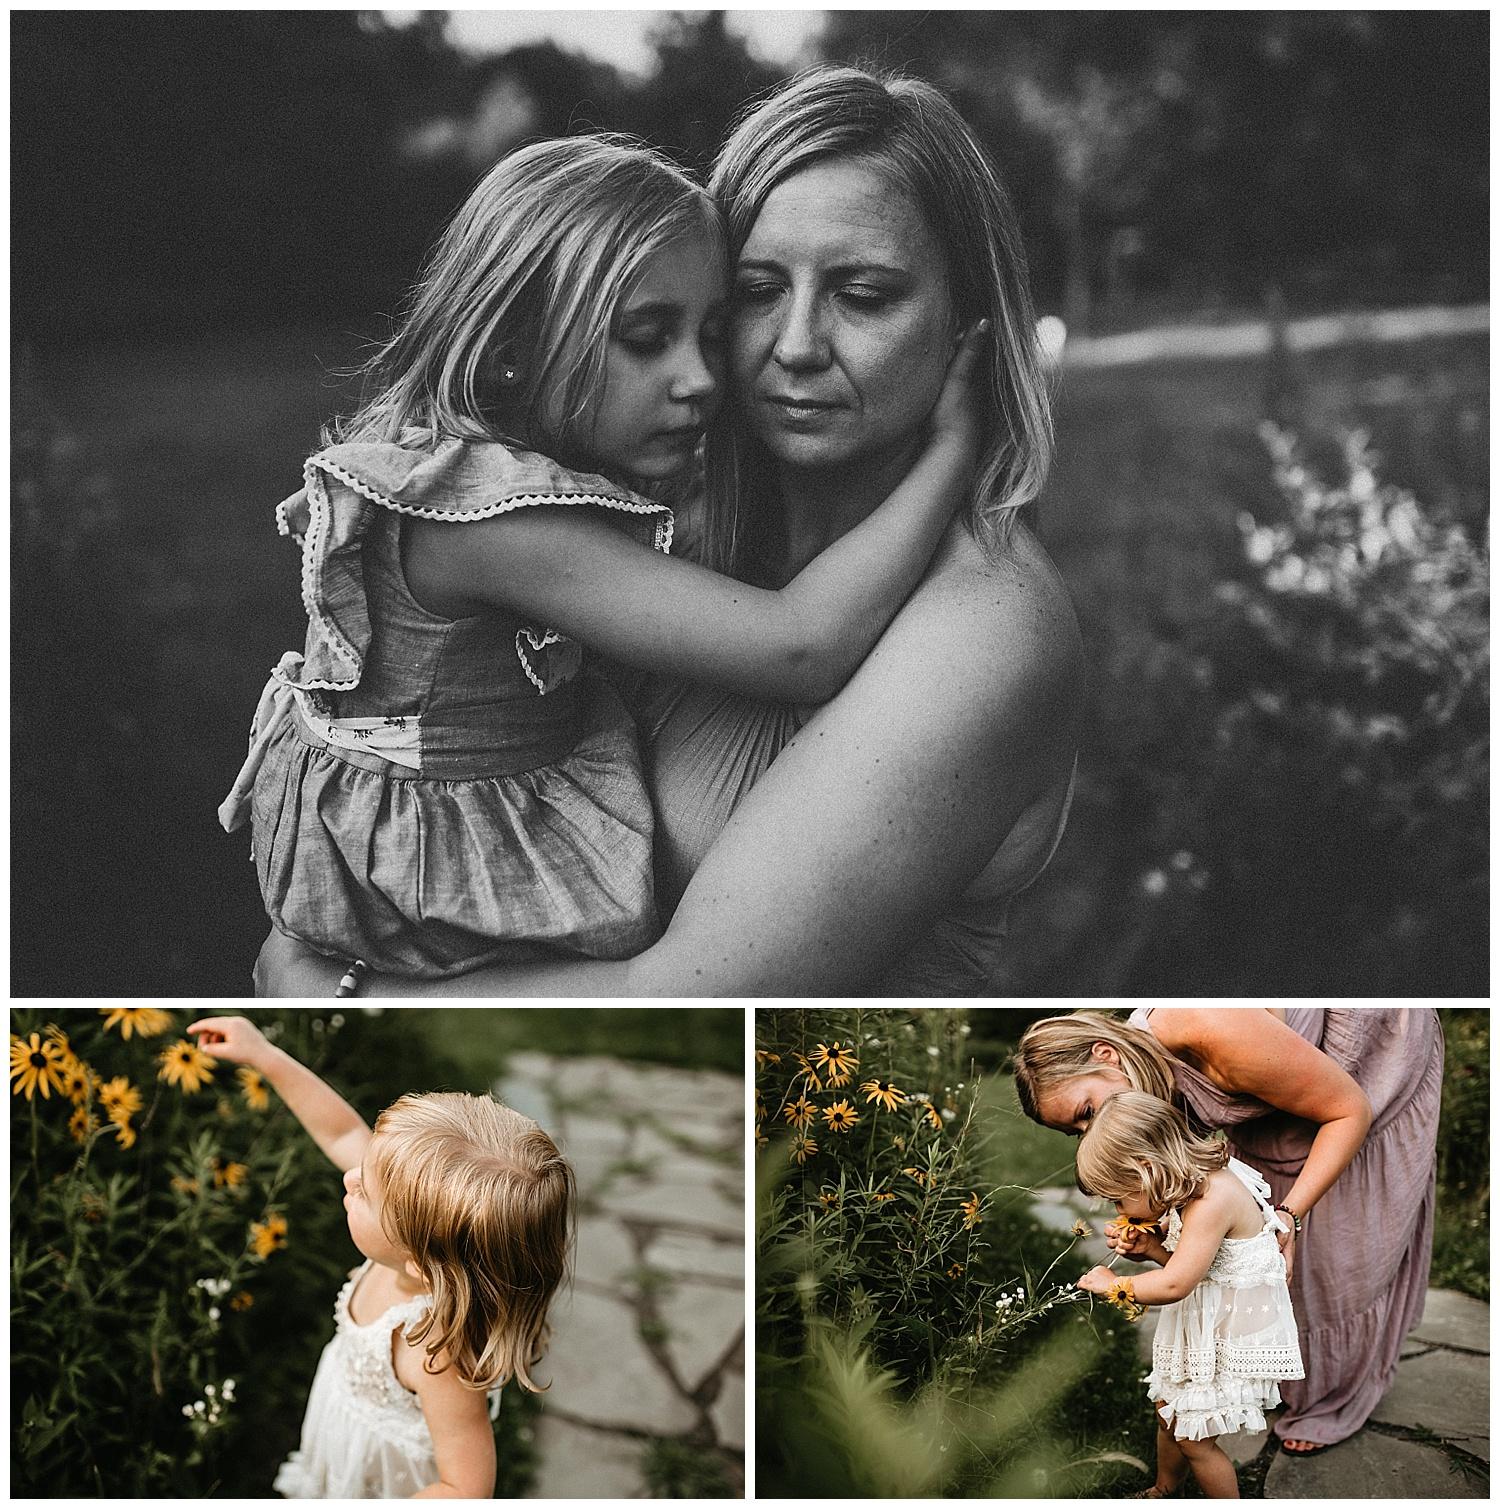 NEPA-Family-Photographer-in-Wilkes-Barre-PA_0164.jpg